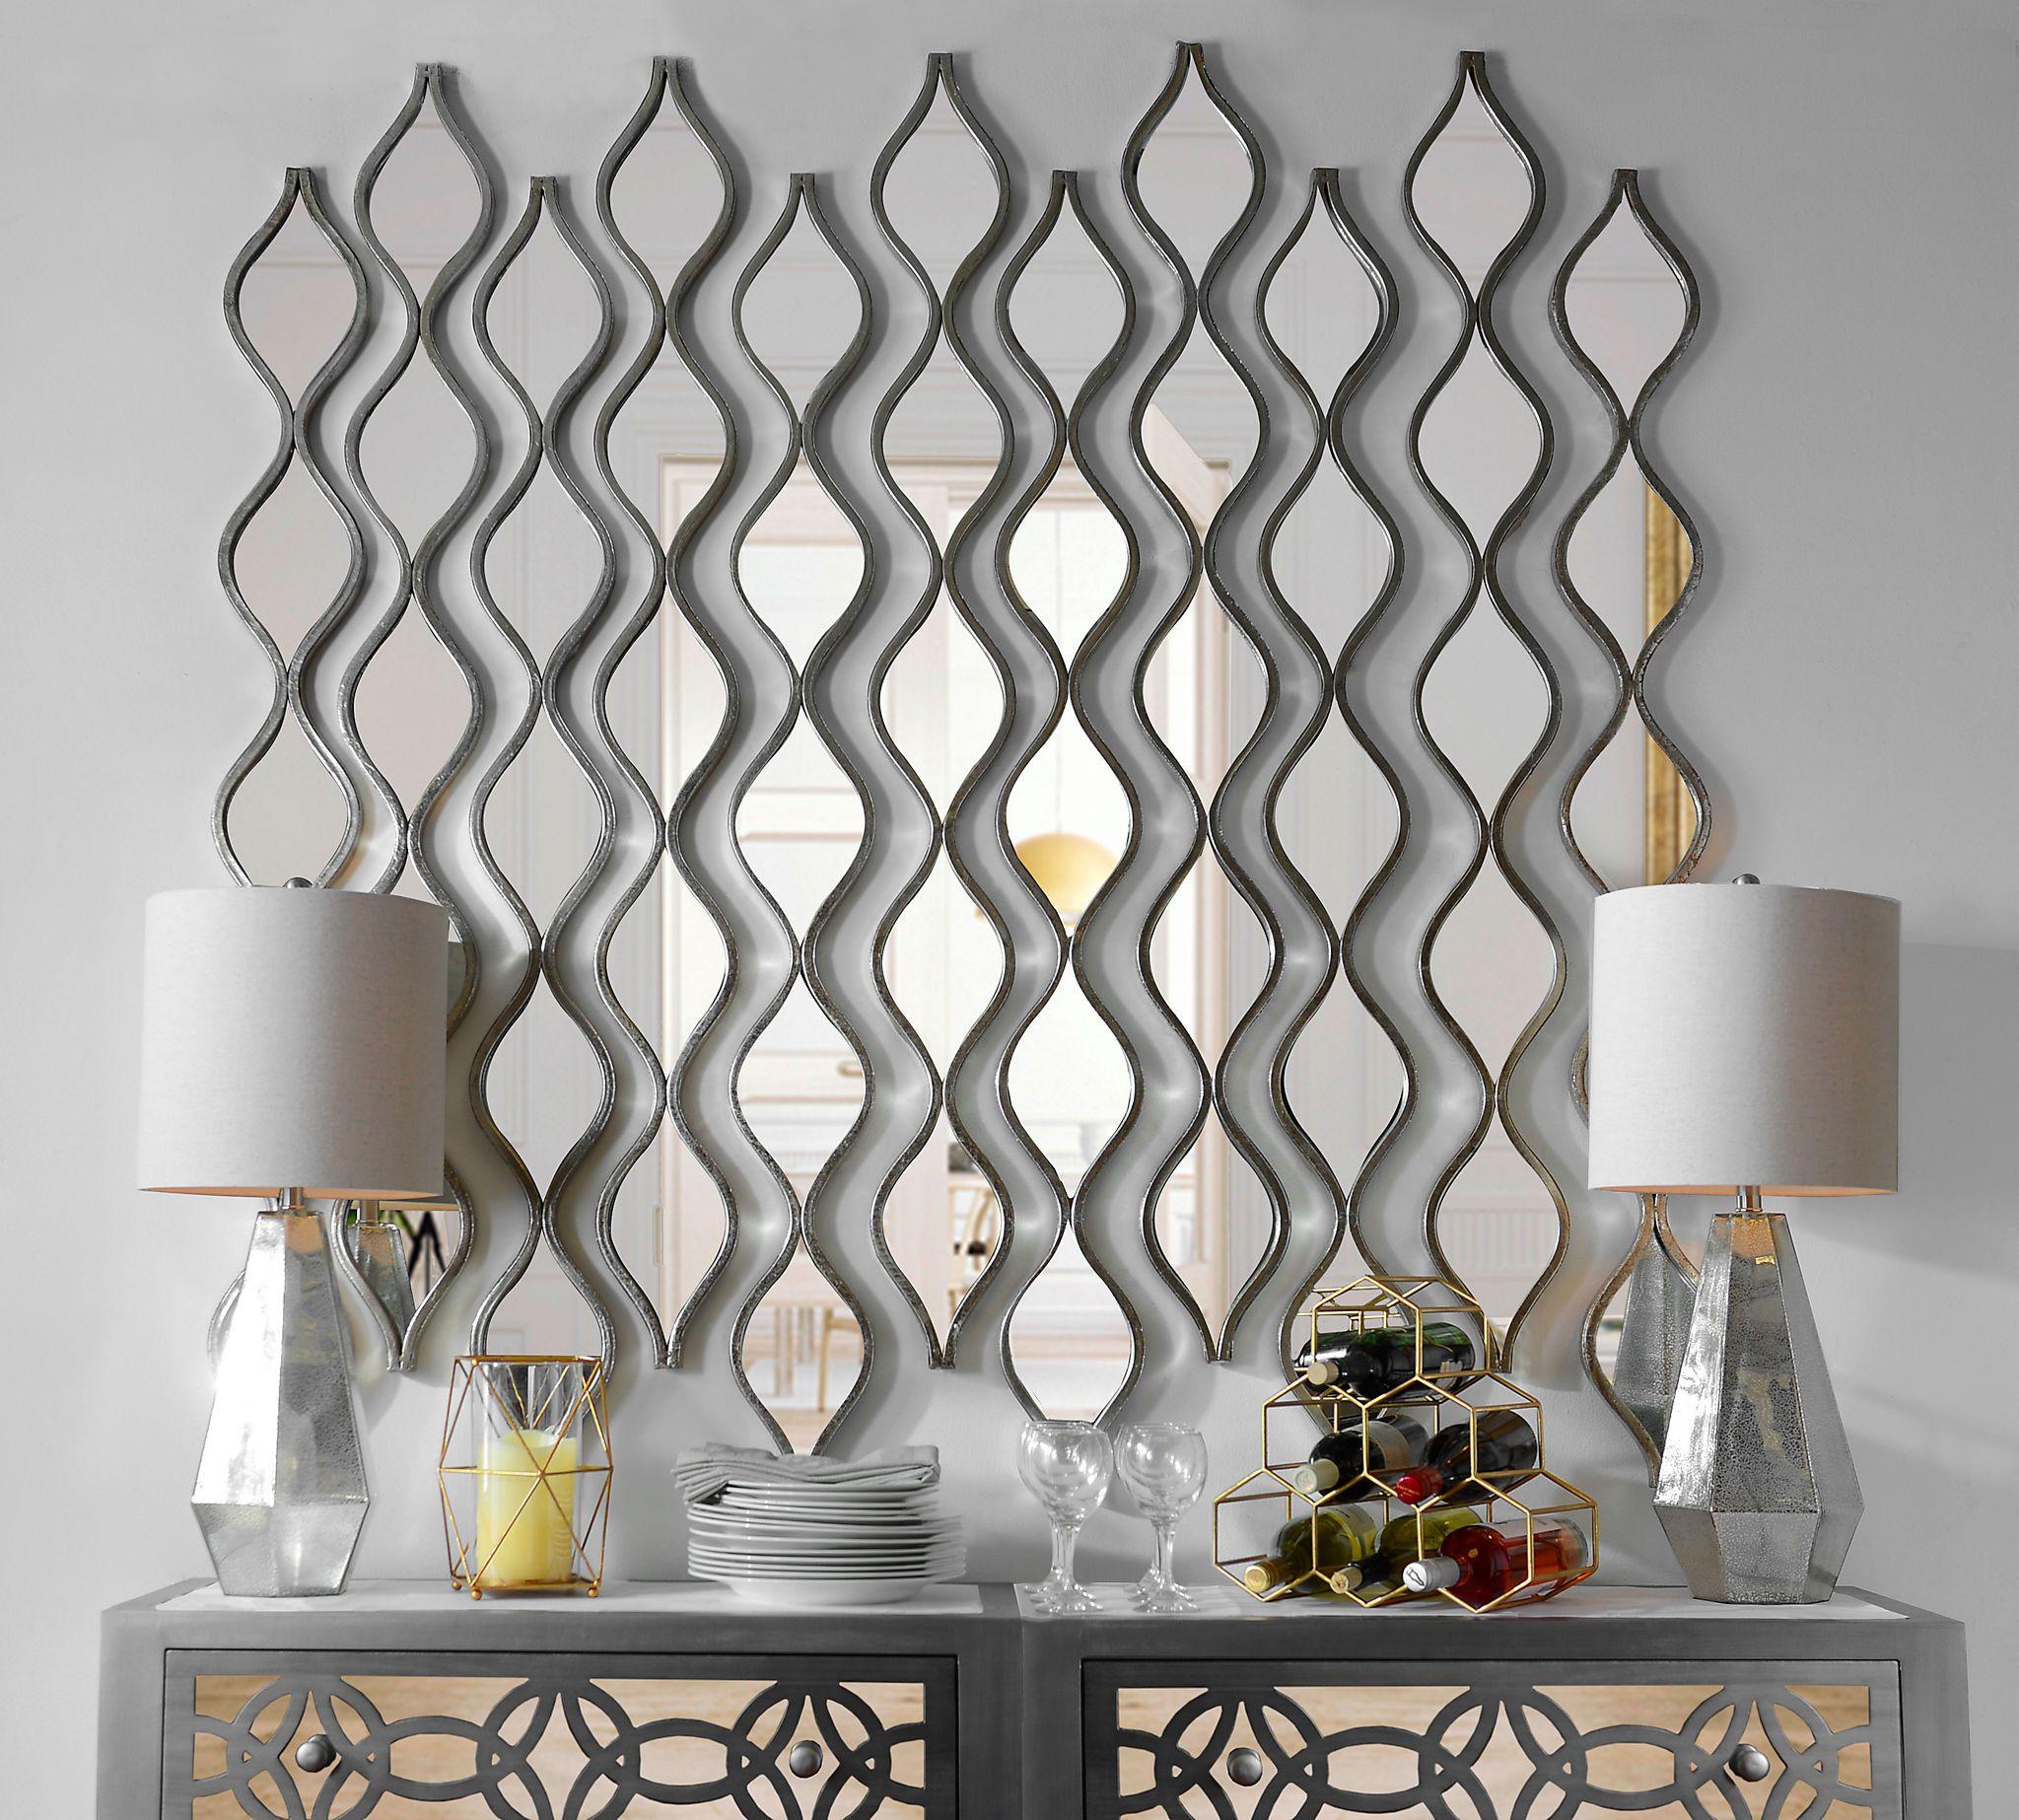 Single Silver Teardrop Panel Mirror 6 25x58 75 Mirror Decor